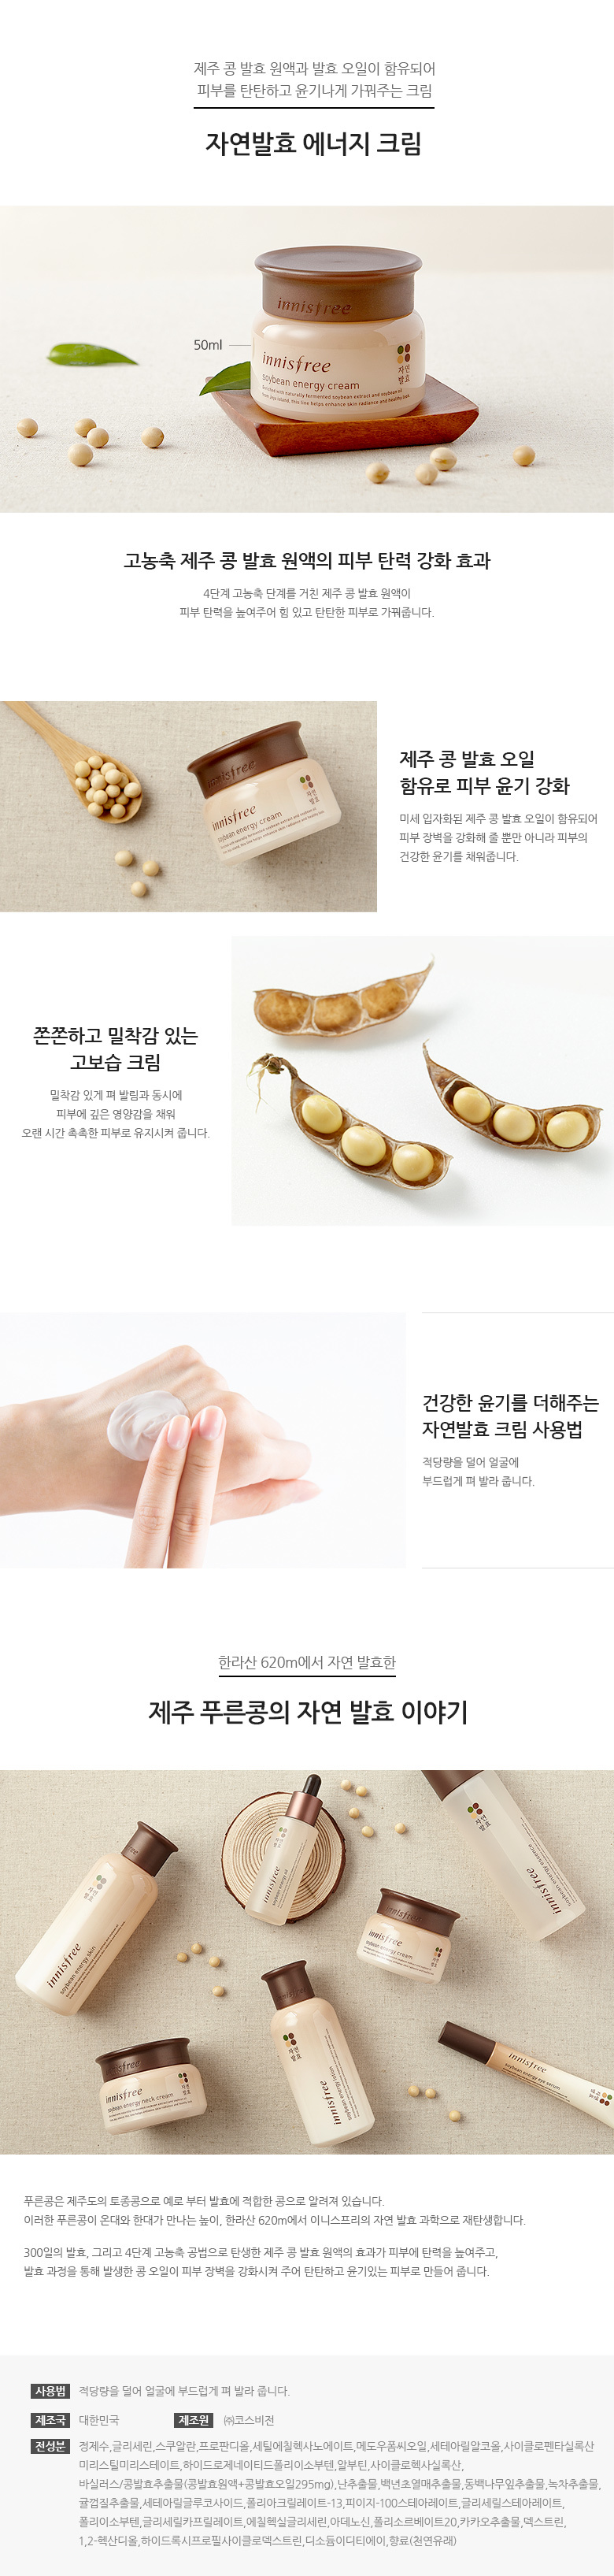 soybean_energy_cream_780.jpg